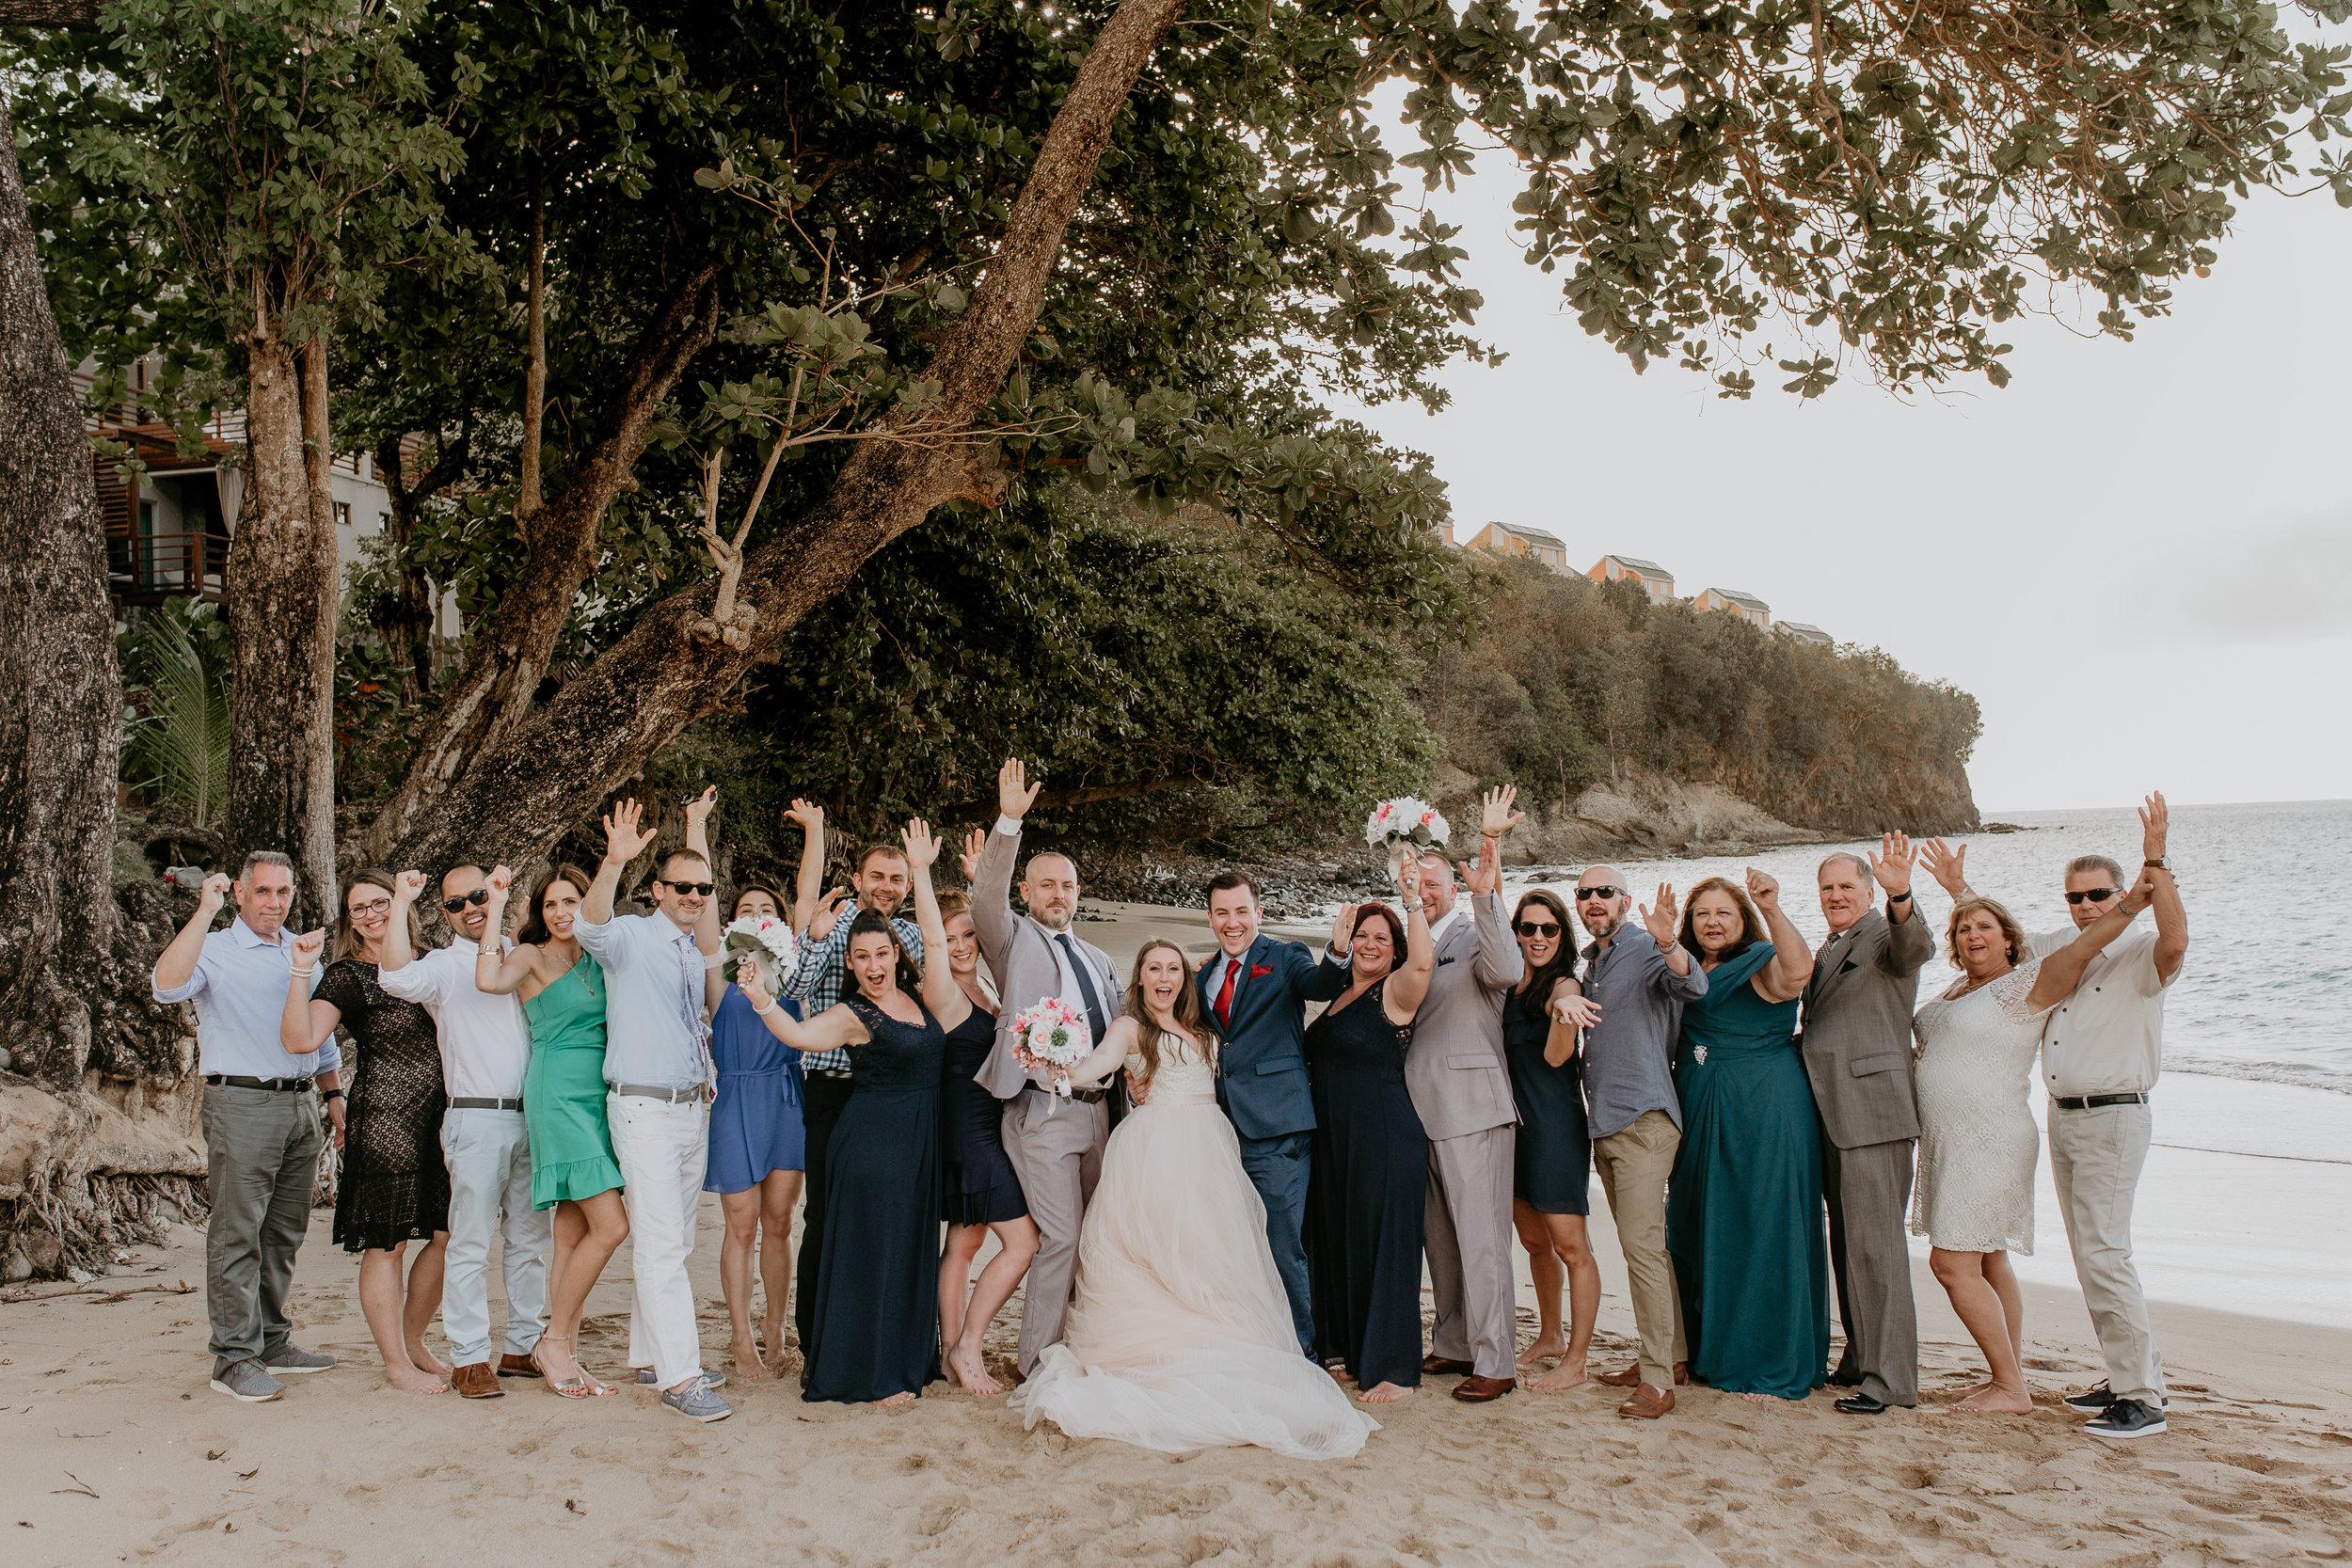 nicole-daacke-photography-destination-wedding-in-st-lucia-sandals-la-toc-intimate-island-wedding-carribean-elopement-photographer-chill-island-wedding-77.jpg